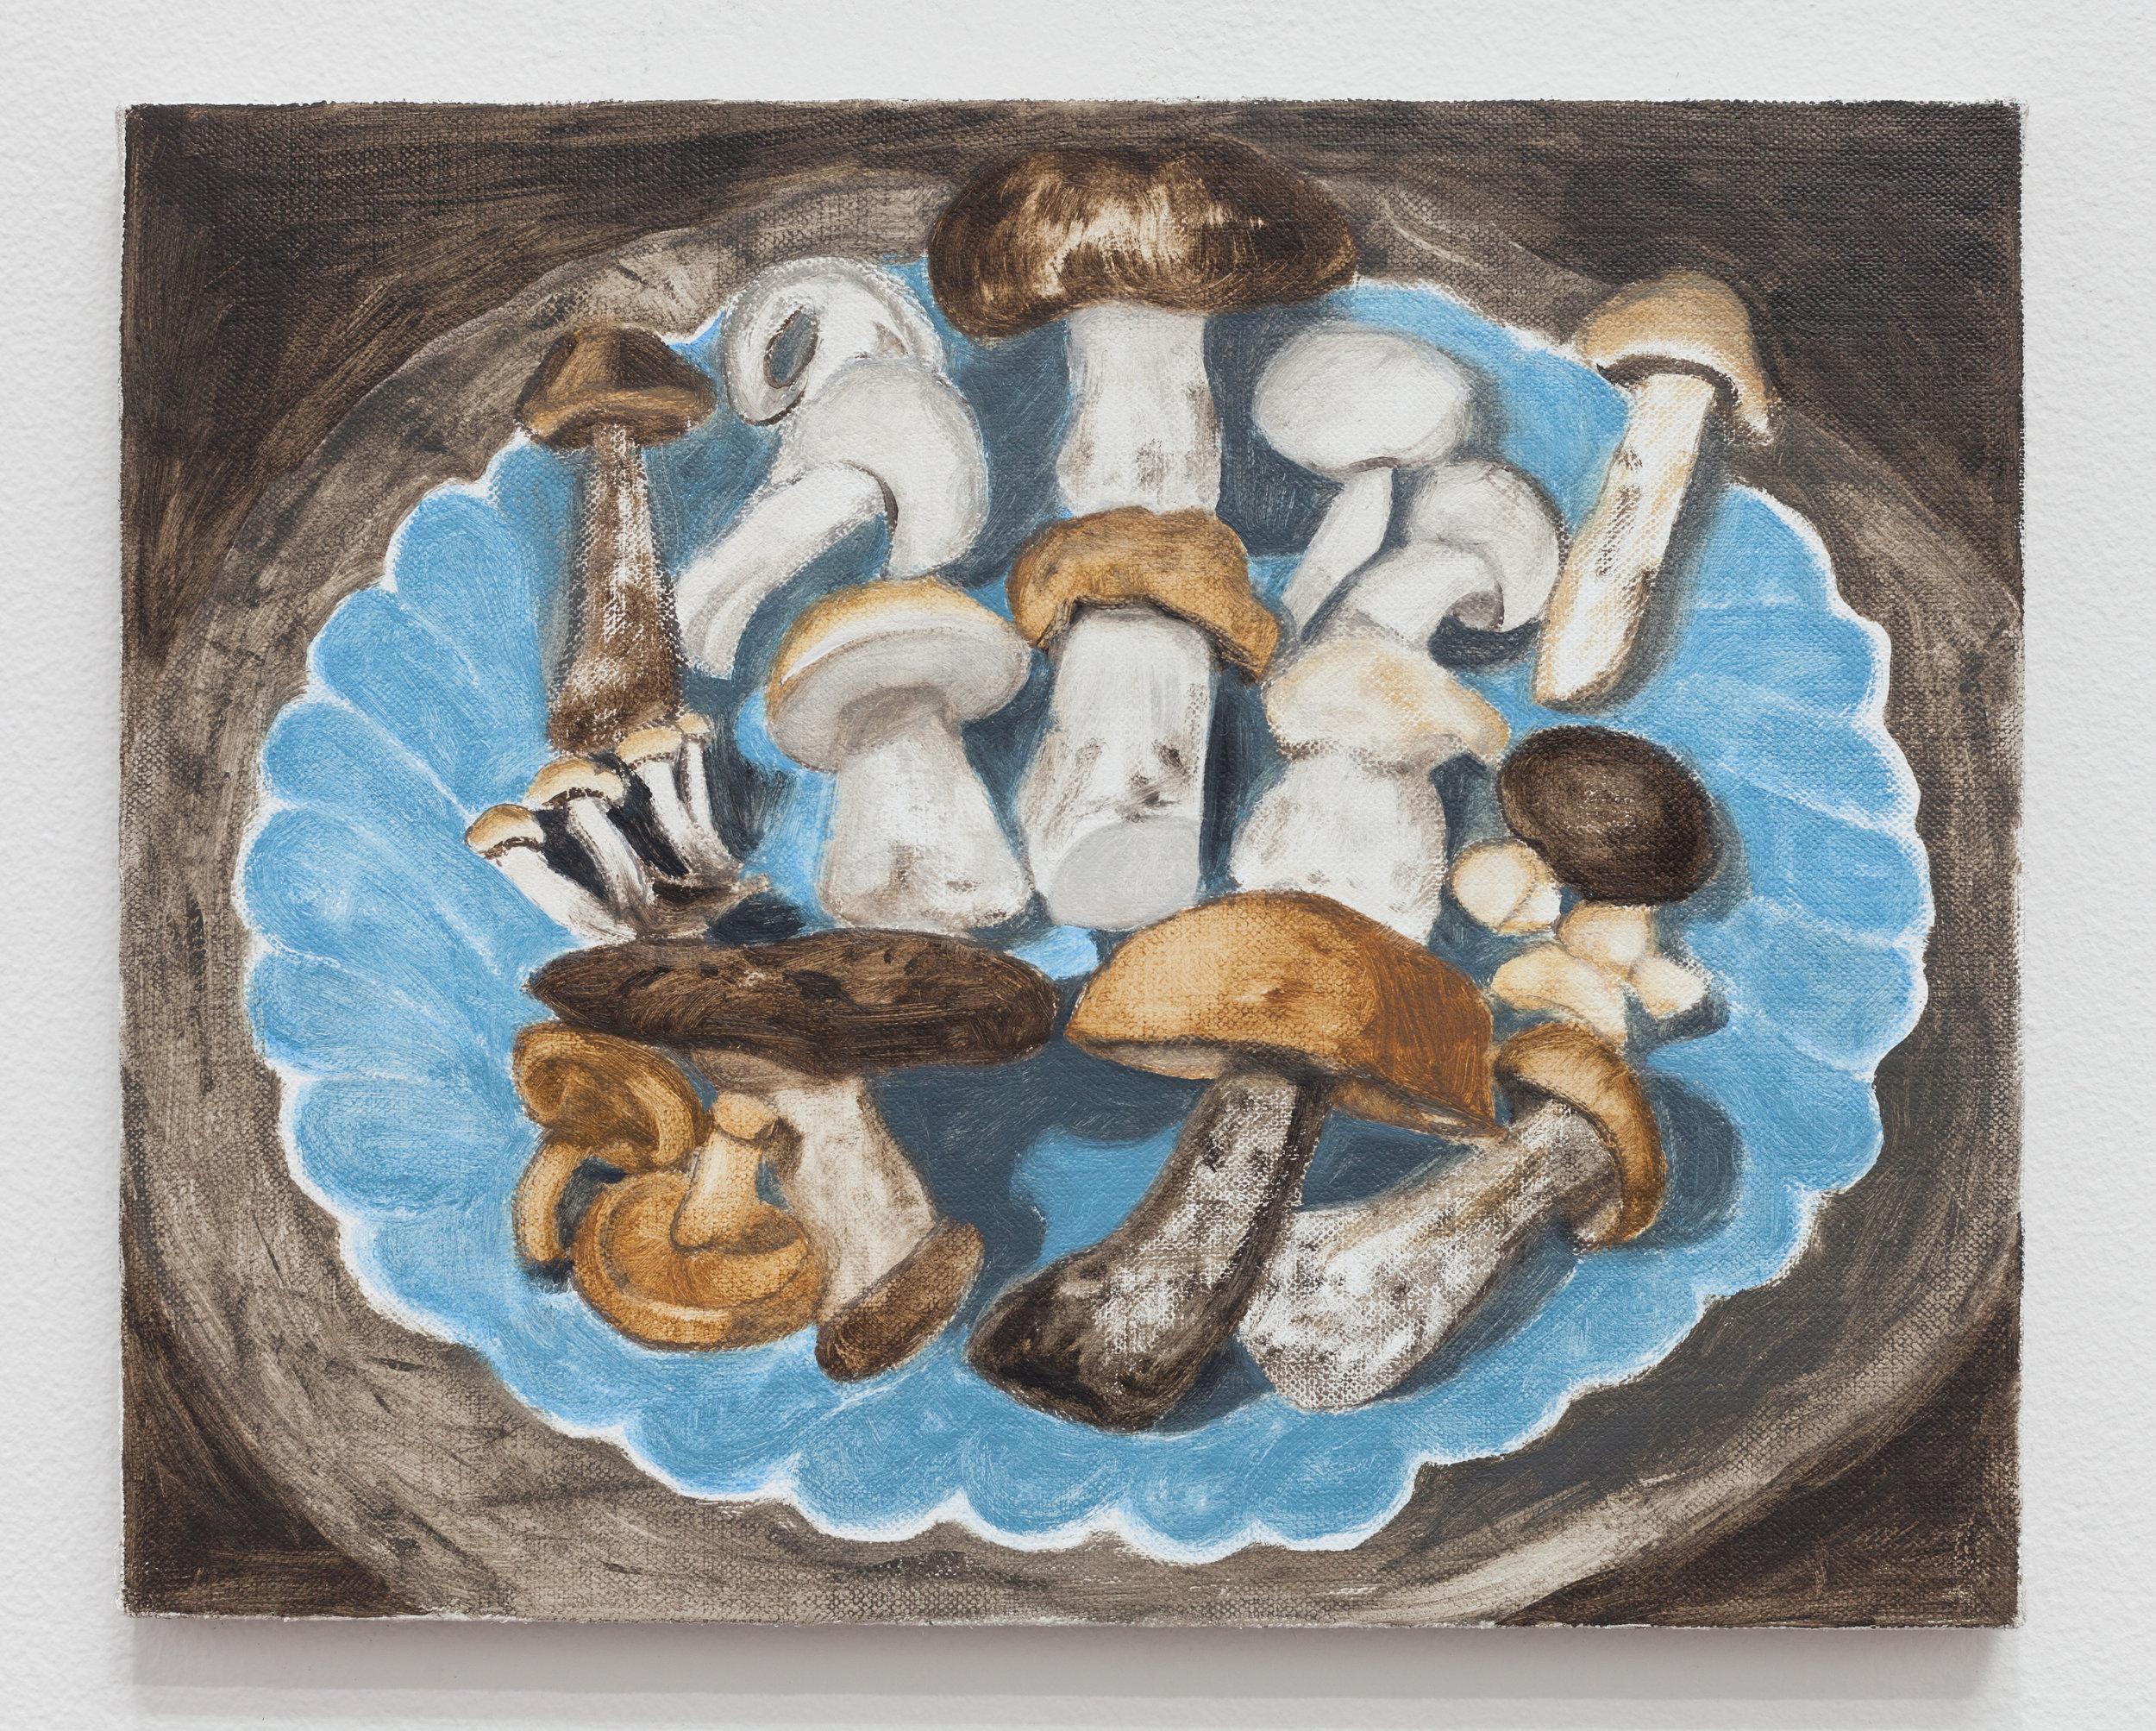 Wild Mushrooms , 2019, oil on linen, 8 × 10 inches (20.32 × 25.40 cm)